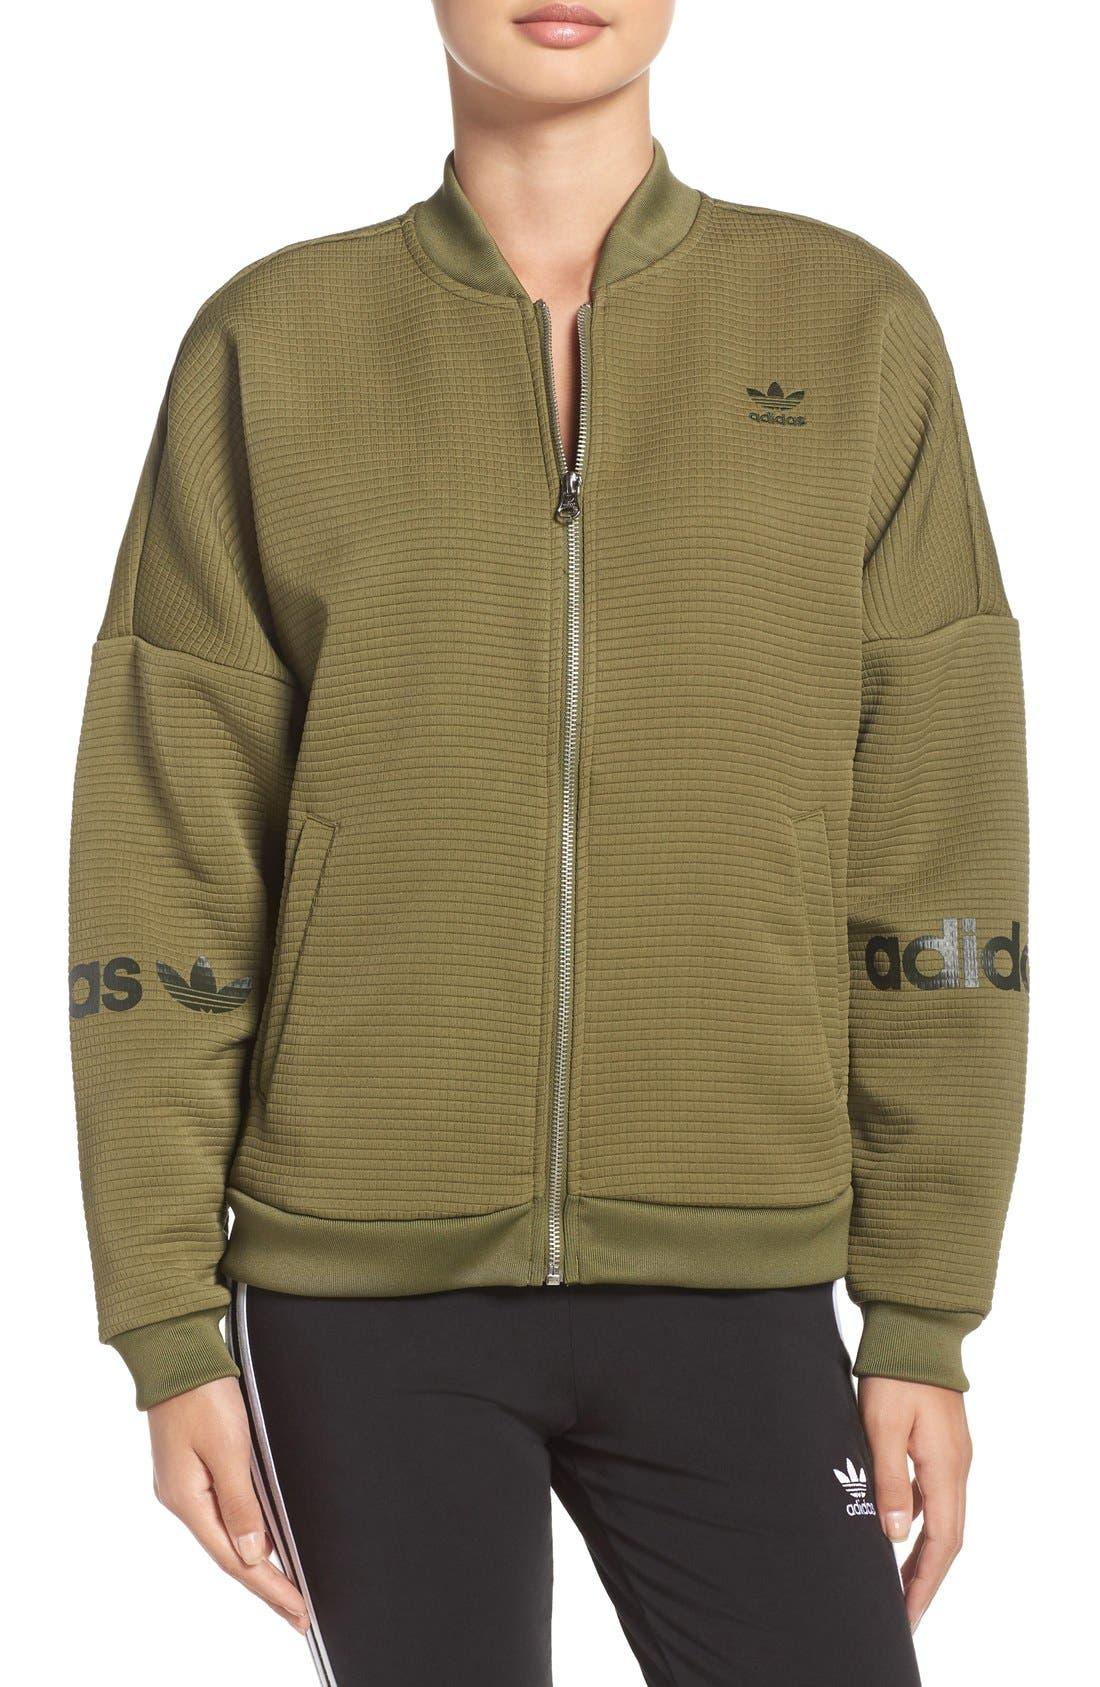 Main Image - adidas Originals 3-Stripes Bomber Jacket